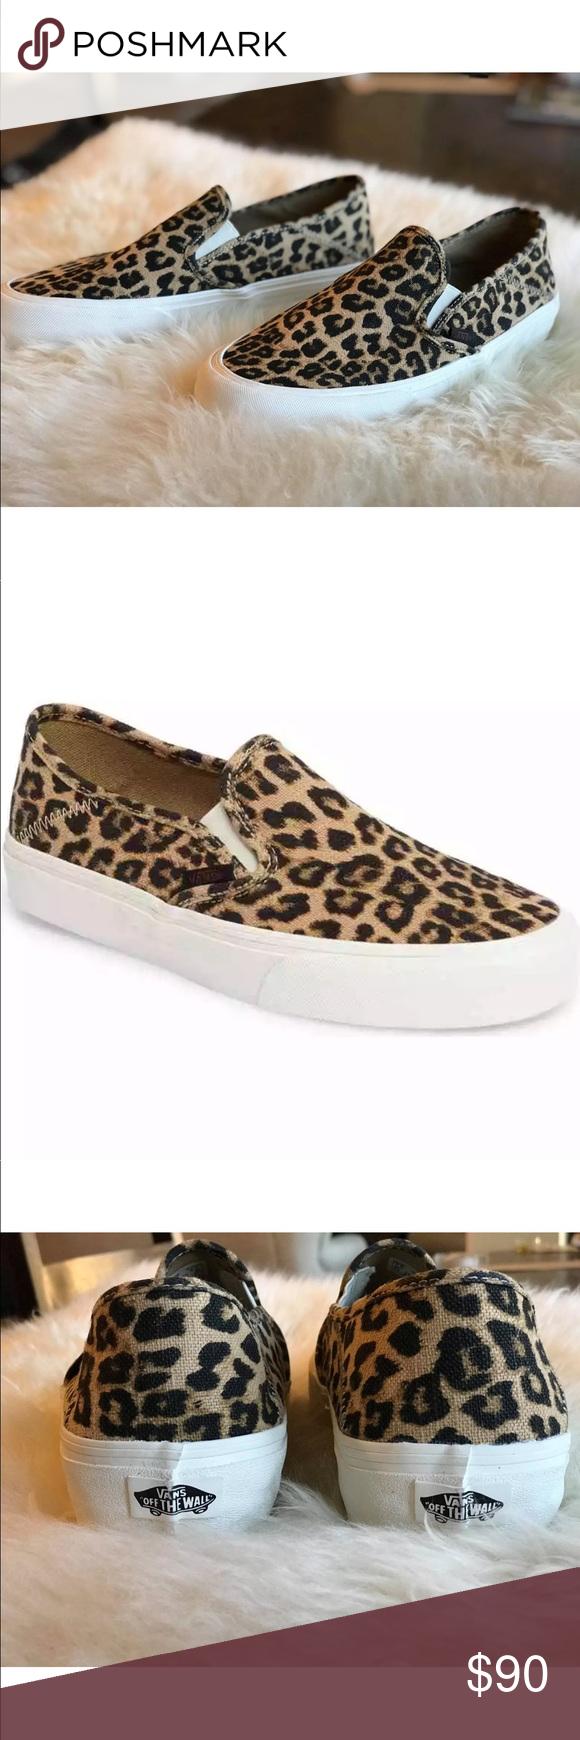 292533bb6c Women s Vans Slip-On Sf Hemp Leopard Shoes NEW AUTHENTIC Vans Classic Slip  On SF